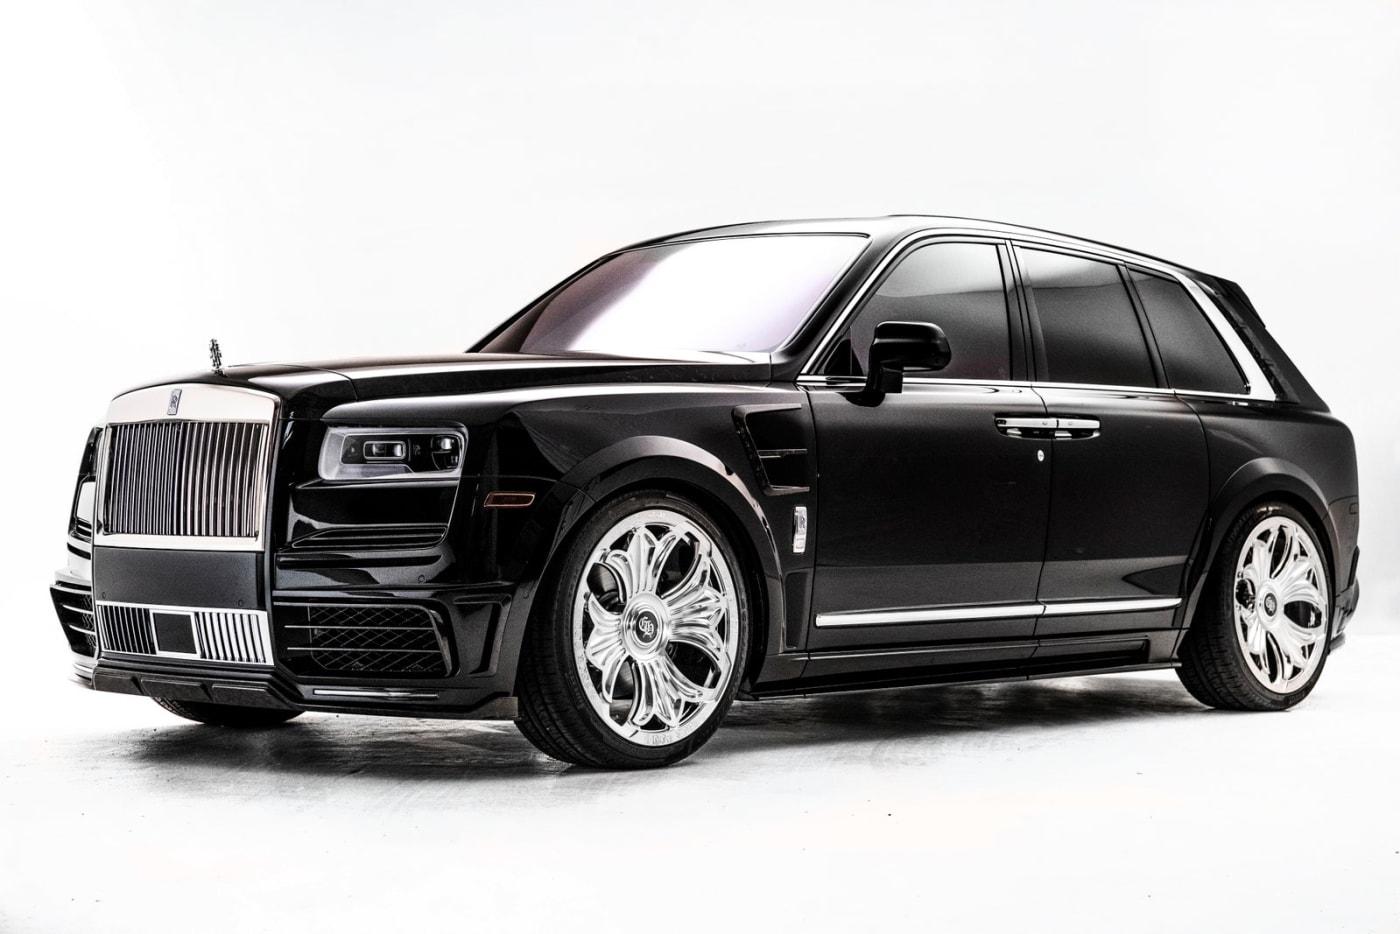 Drake Chrome Hearts Rolls-Royce